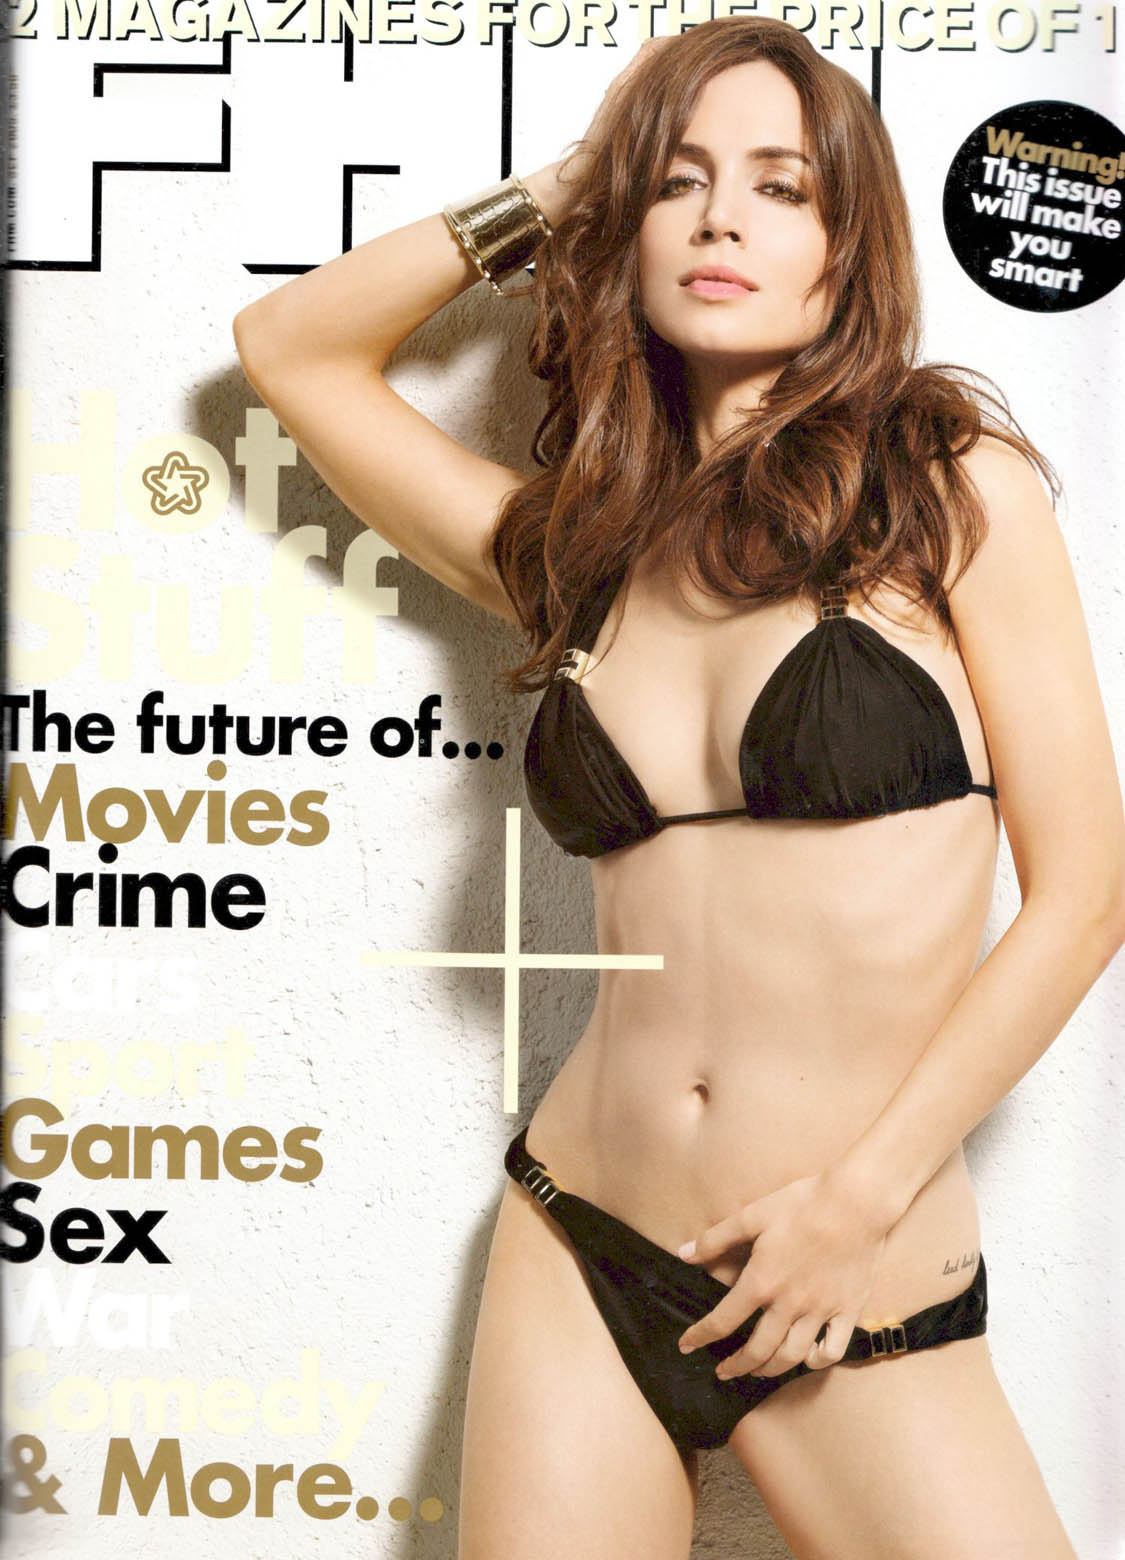 Eliza Dushku Bikini Pictures In FHM Magazine